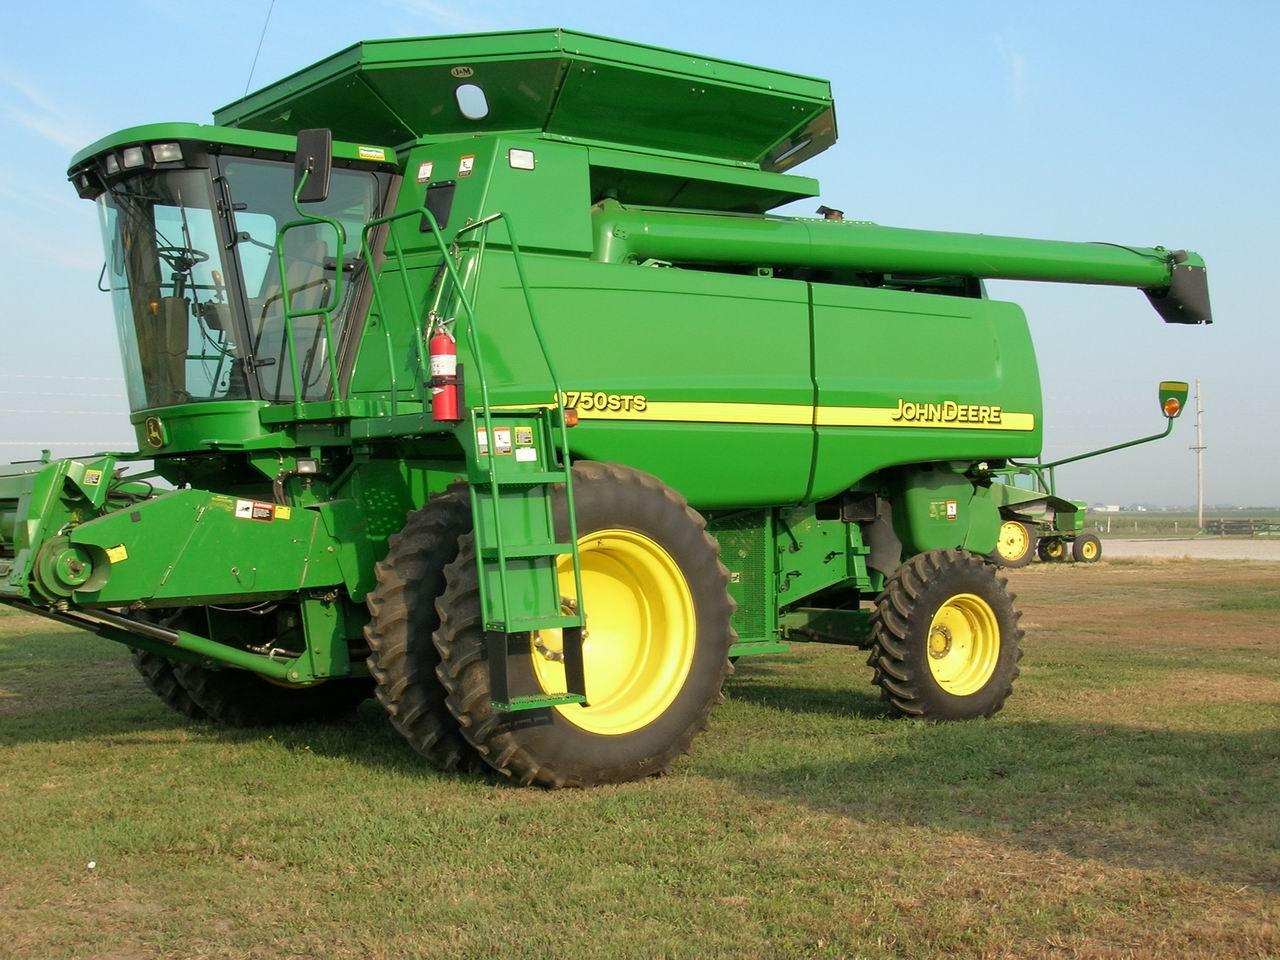 John Dere tractor